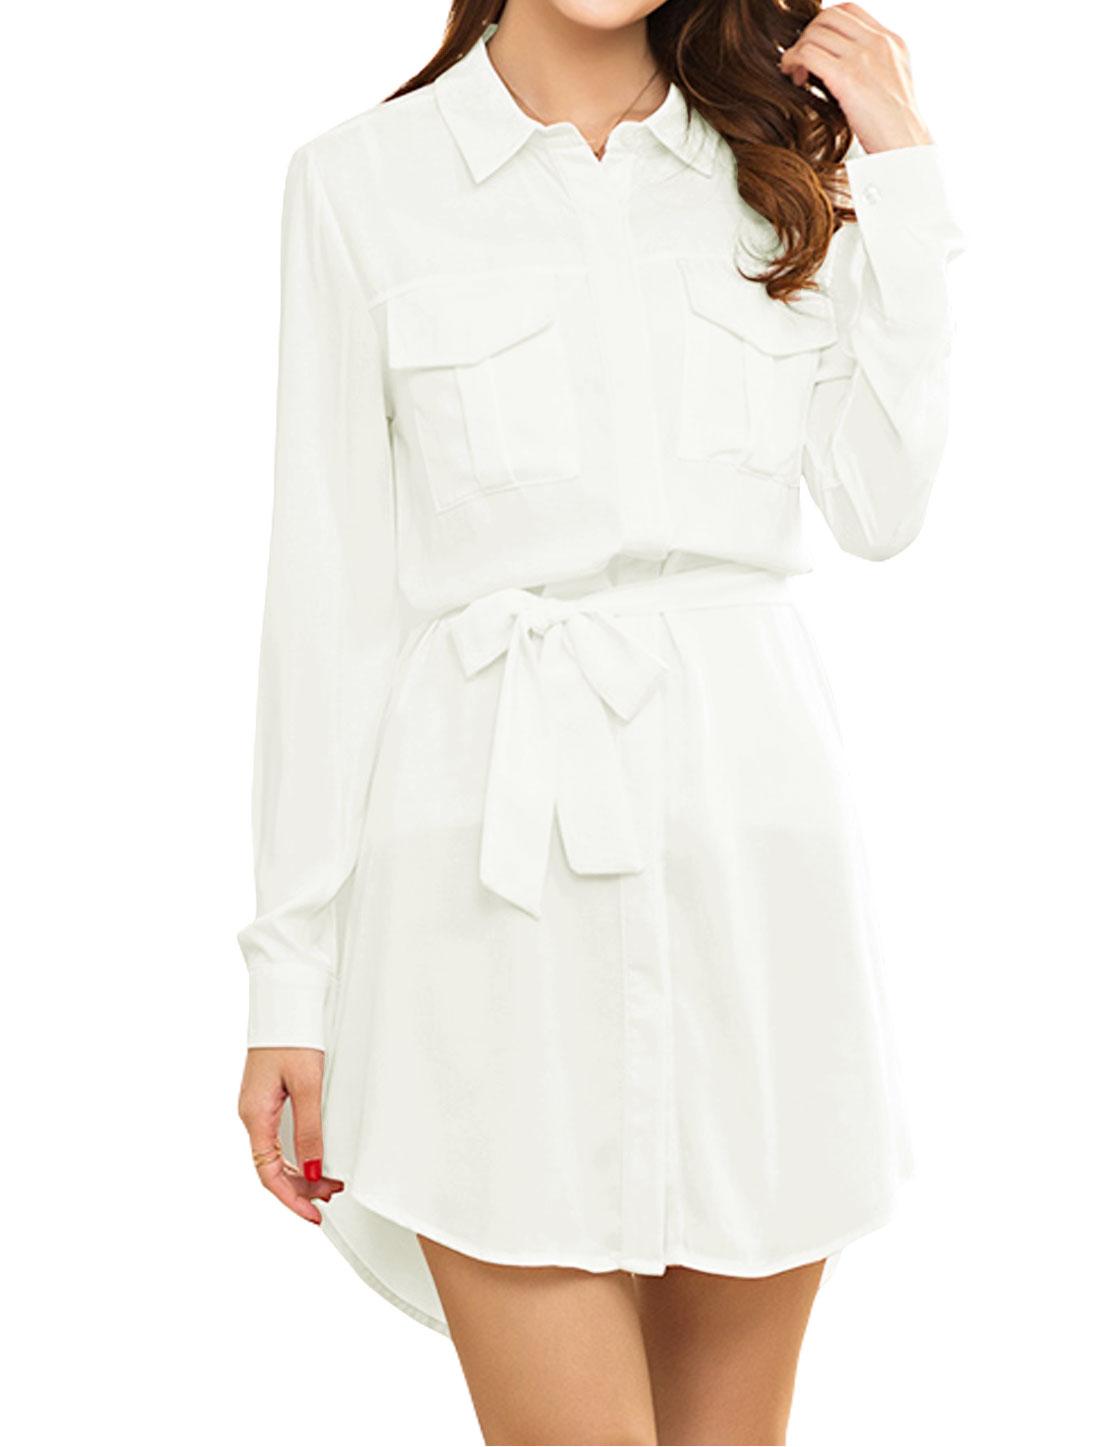 Woman Roll Up Sleeves Tunic Shirt Dress w Waist String White M